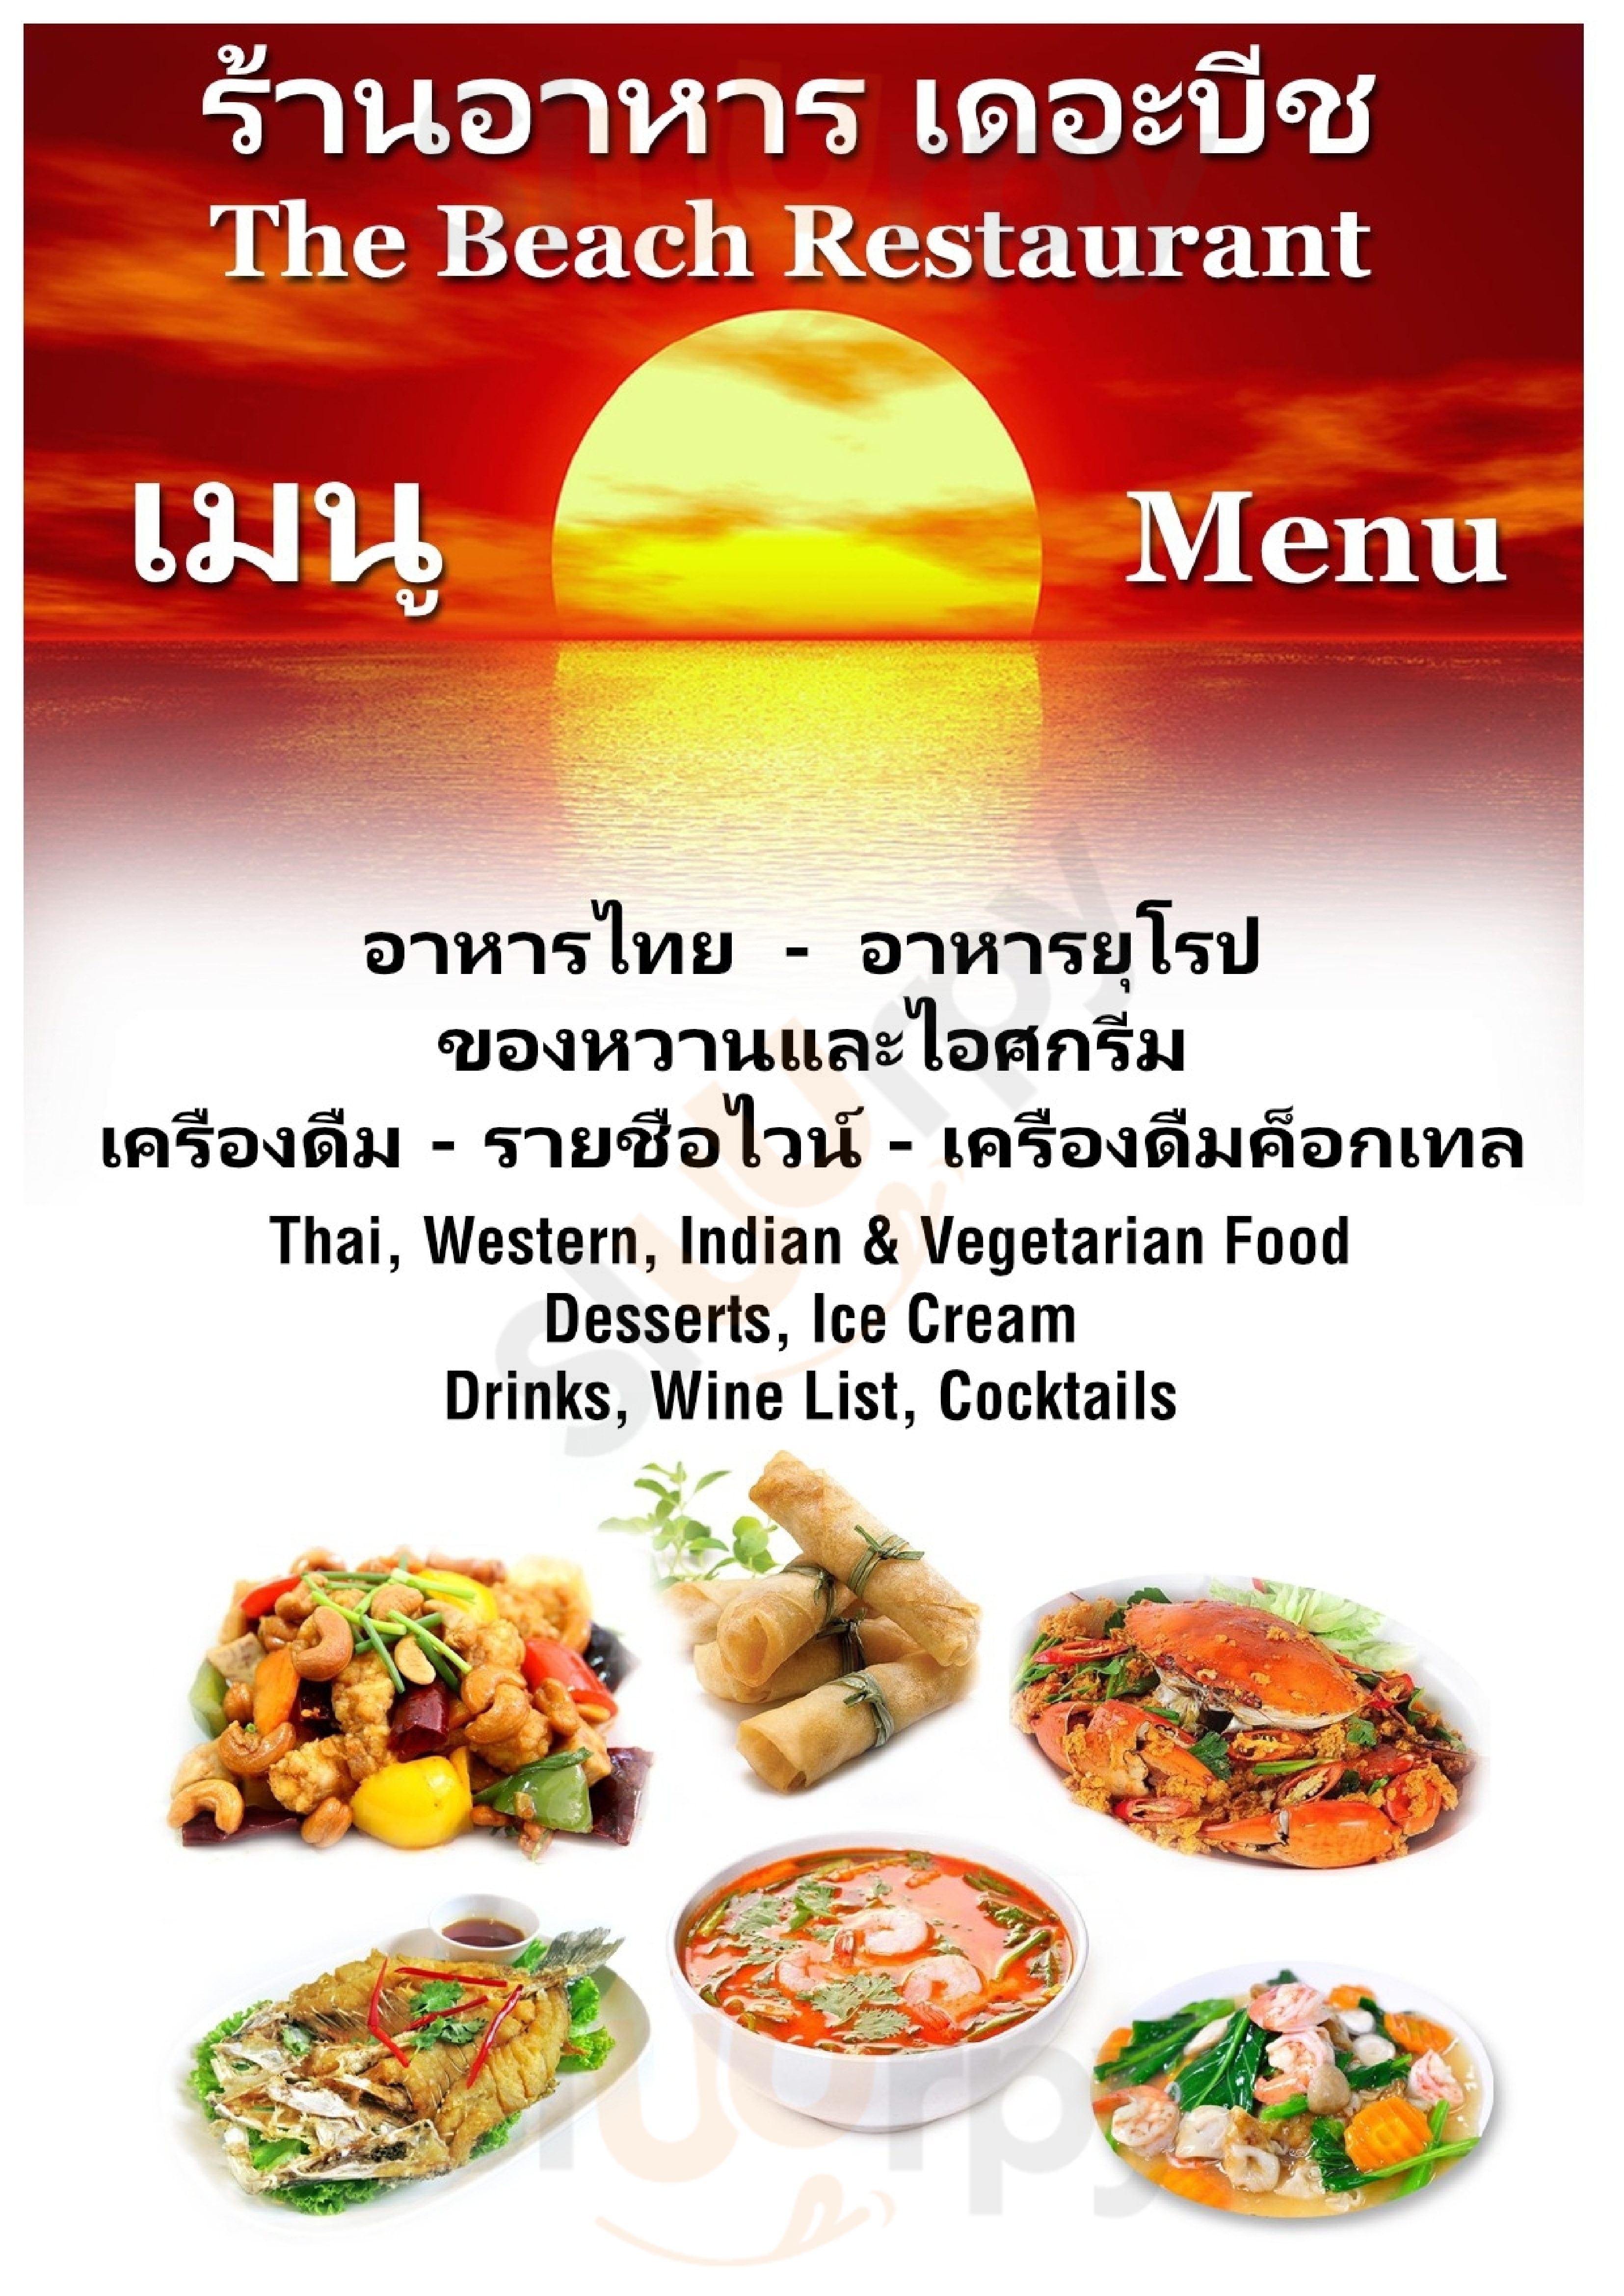 The Beach Restaurant บ้านบางเสร่ Menu - 1